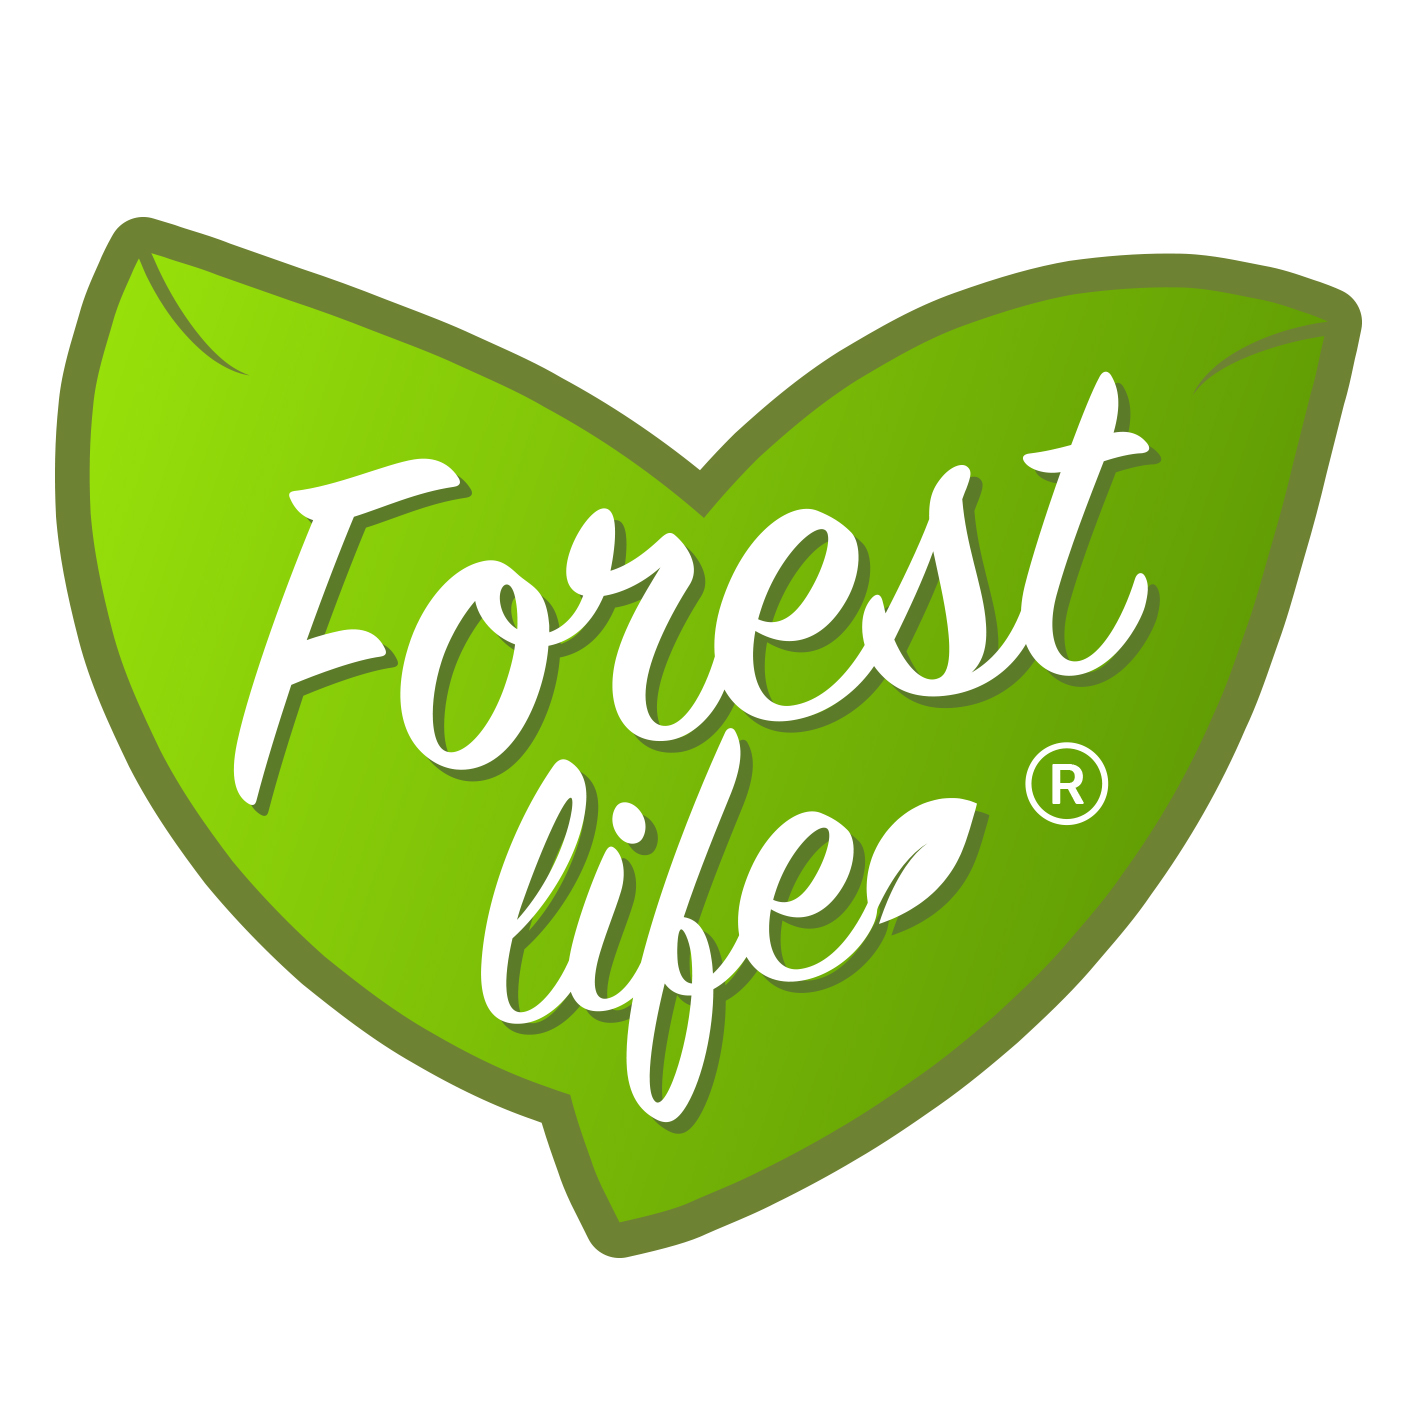 LOGO_FORESTLIFE02B.jpg